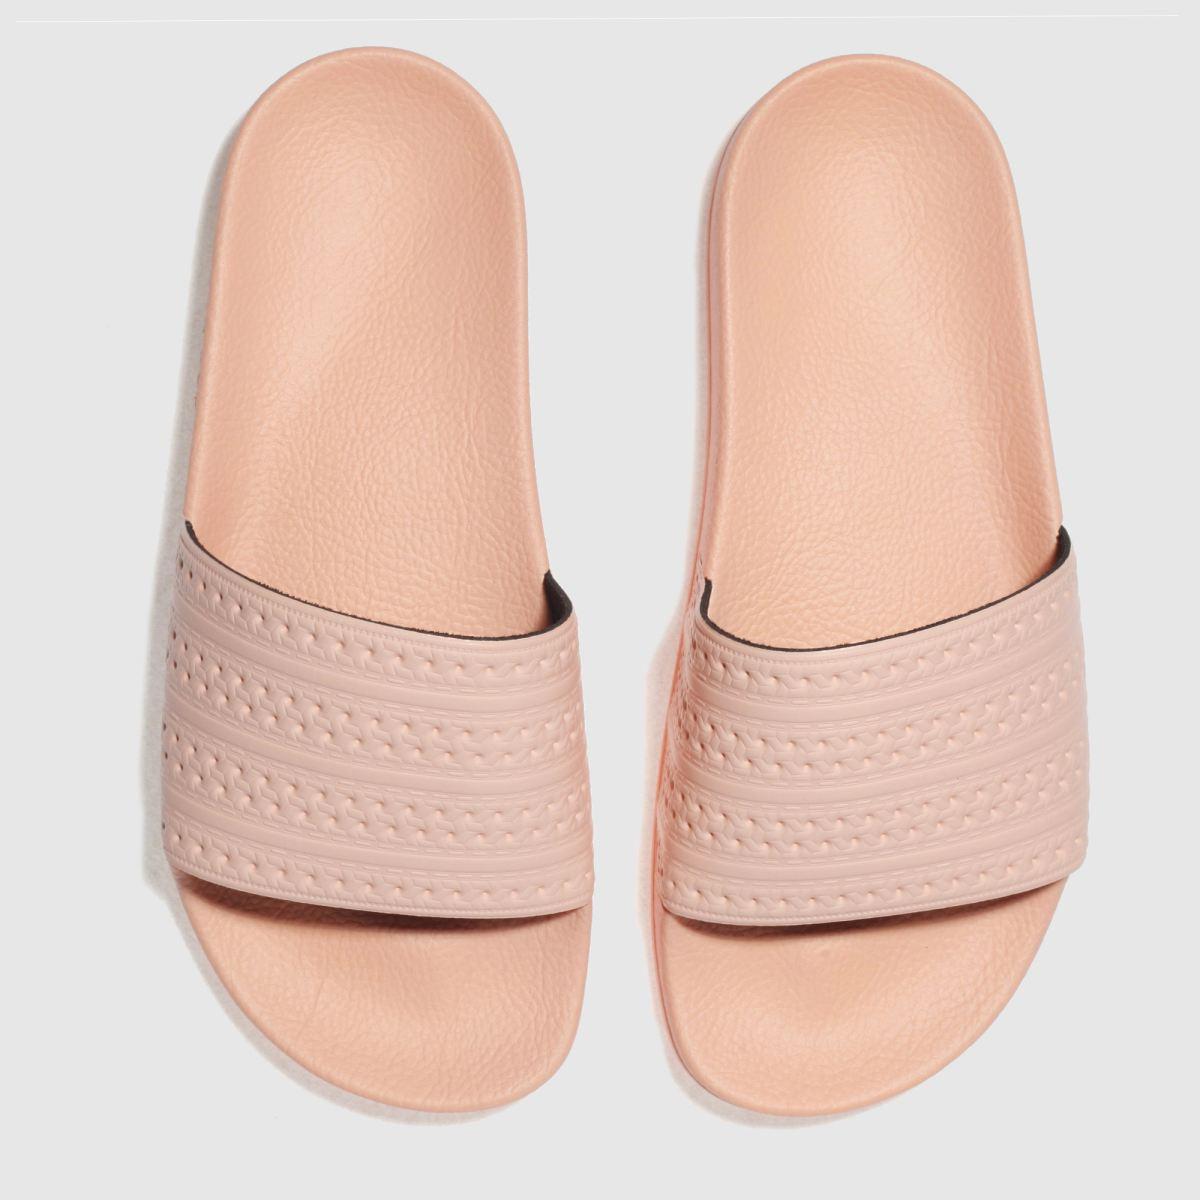 Adidas Pale Pink Adilette Slide Sandals